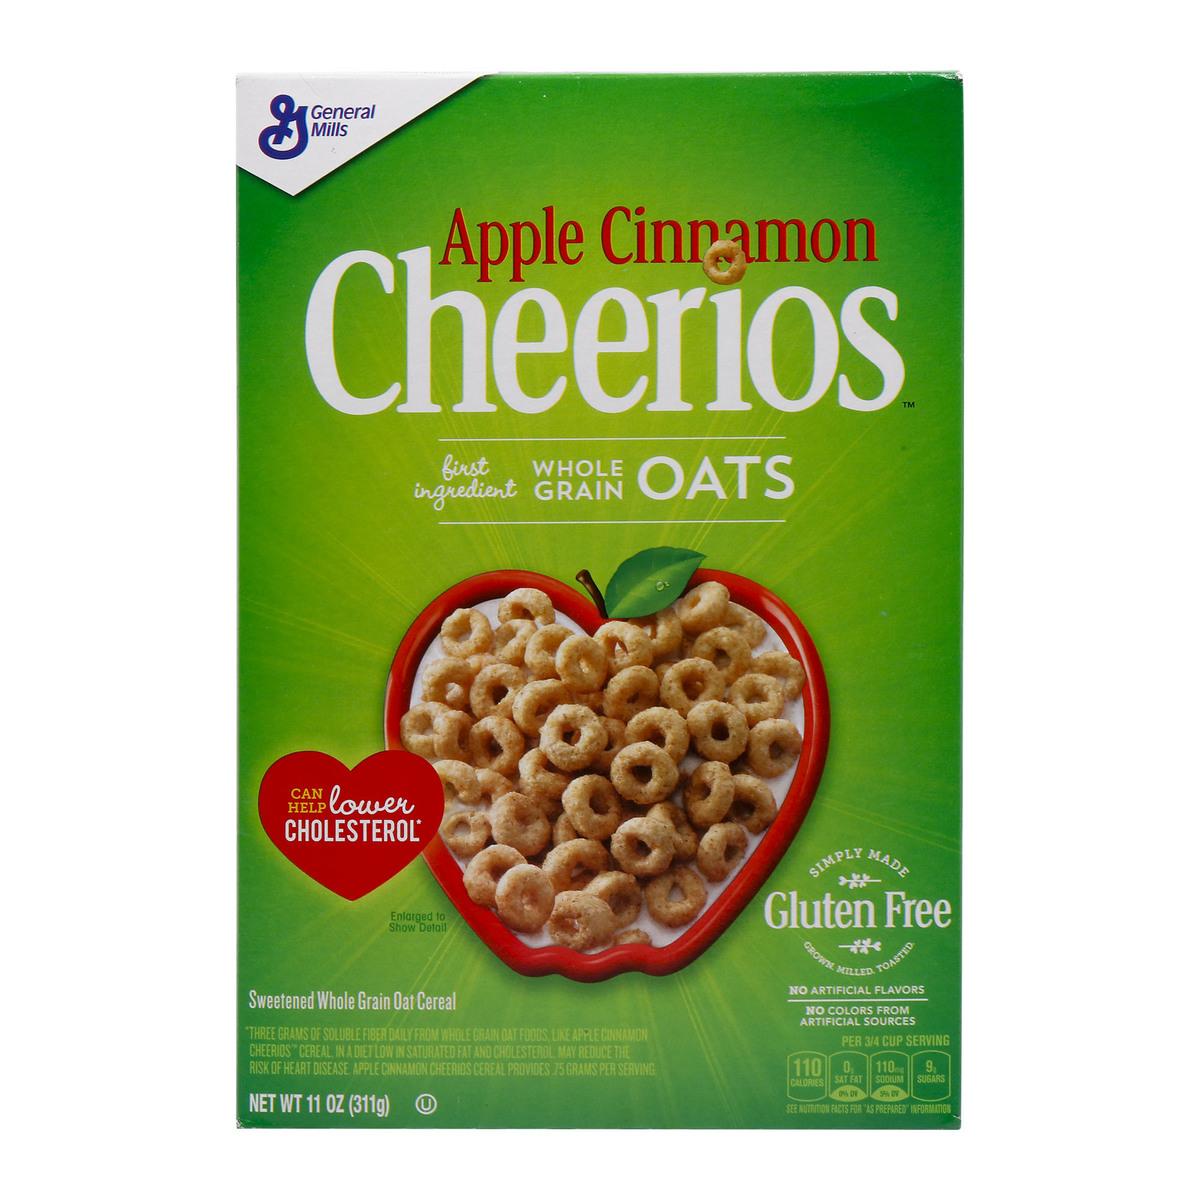 Apple Cinnamon Cheerios 311g